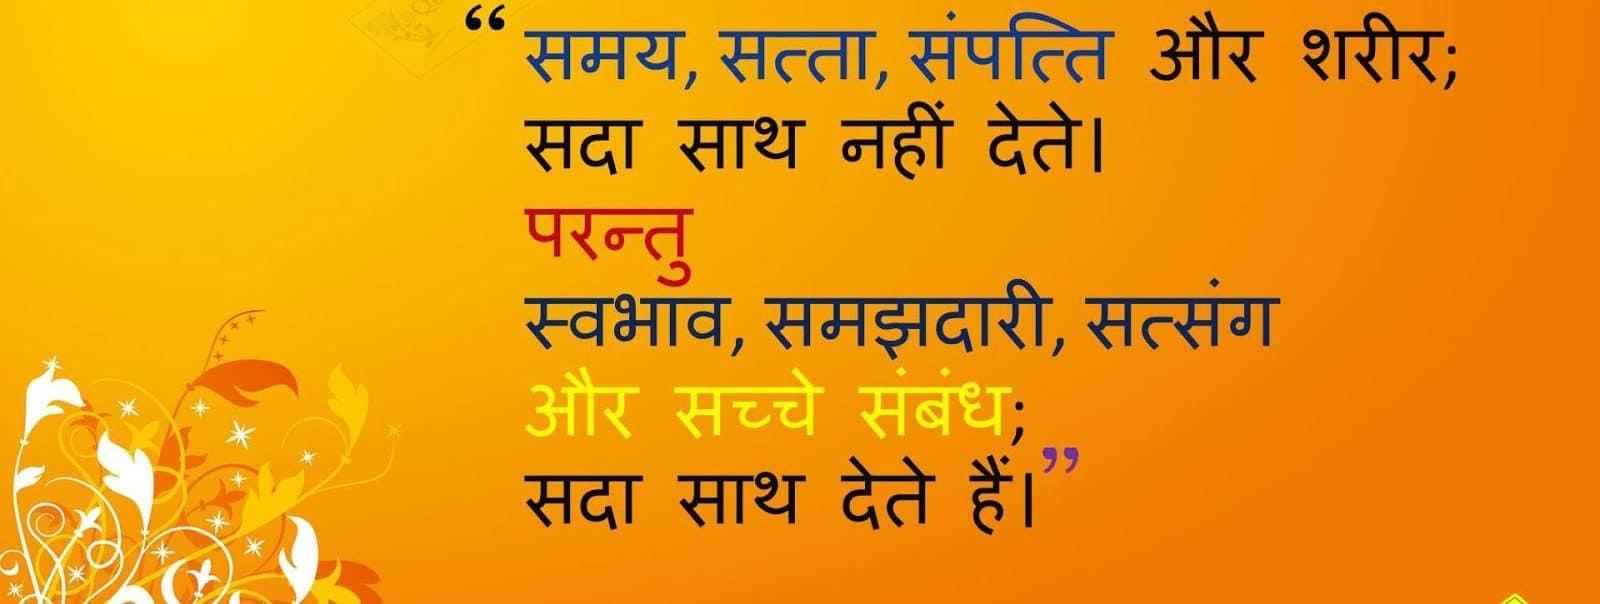 Hindi Script Image